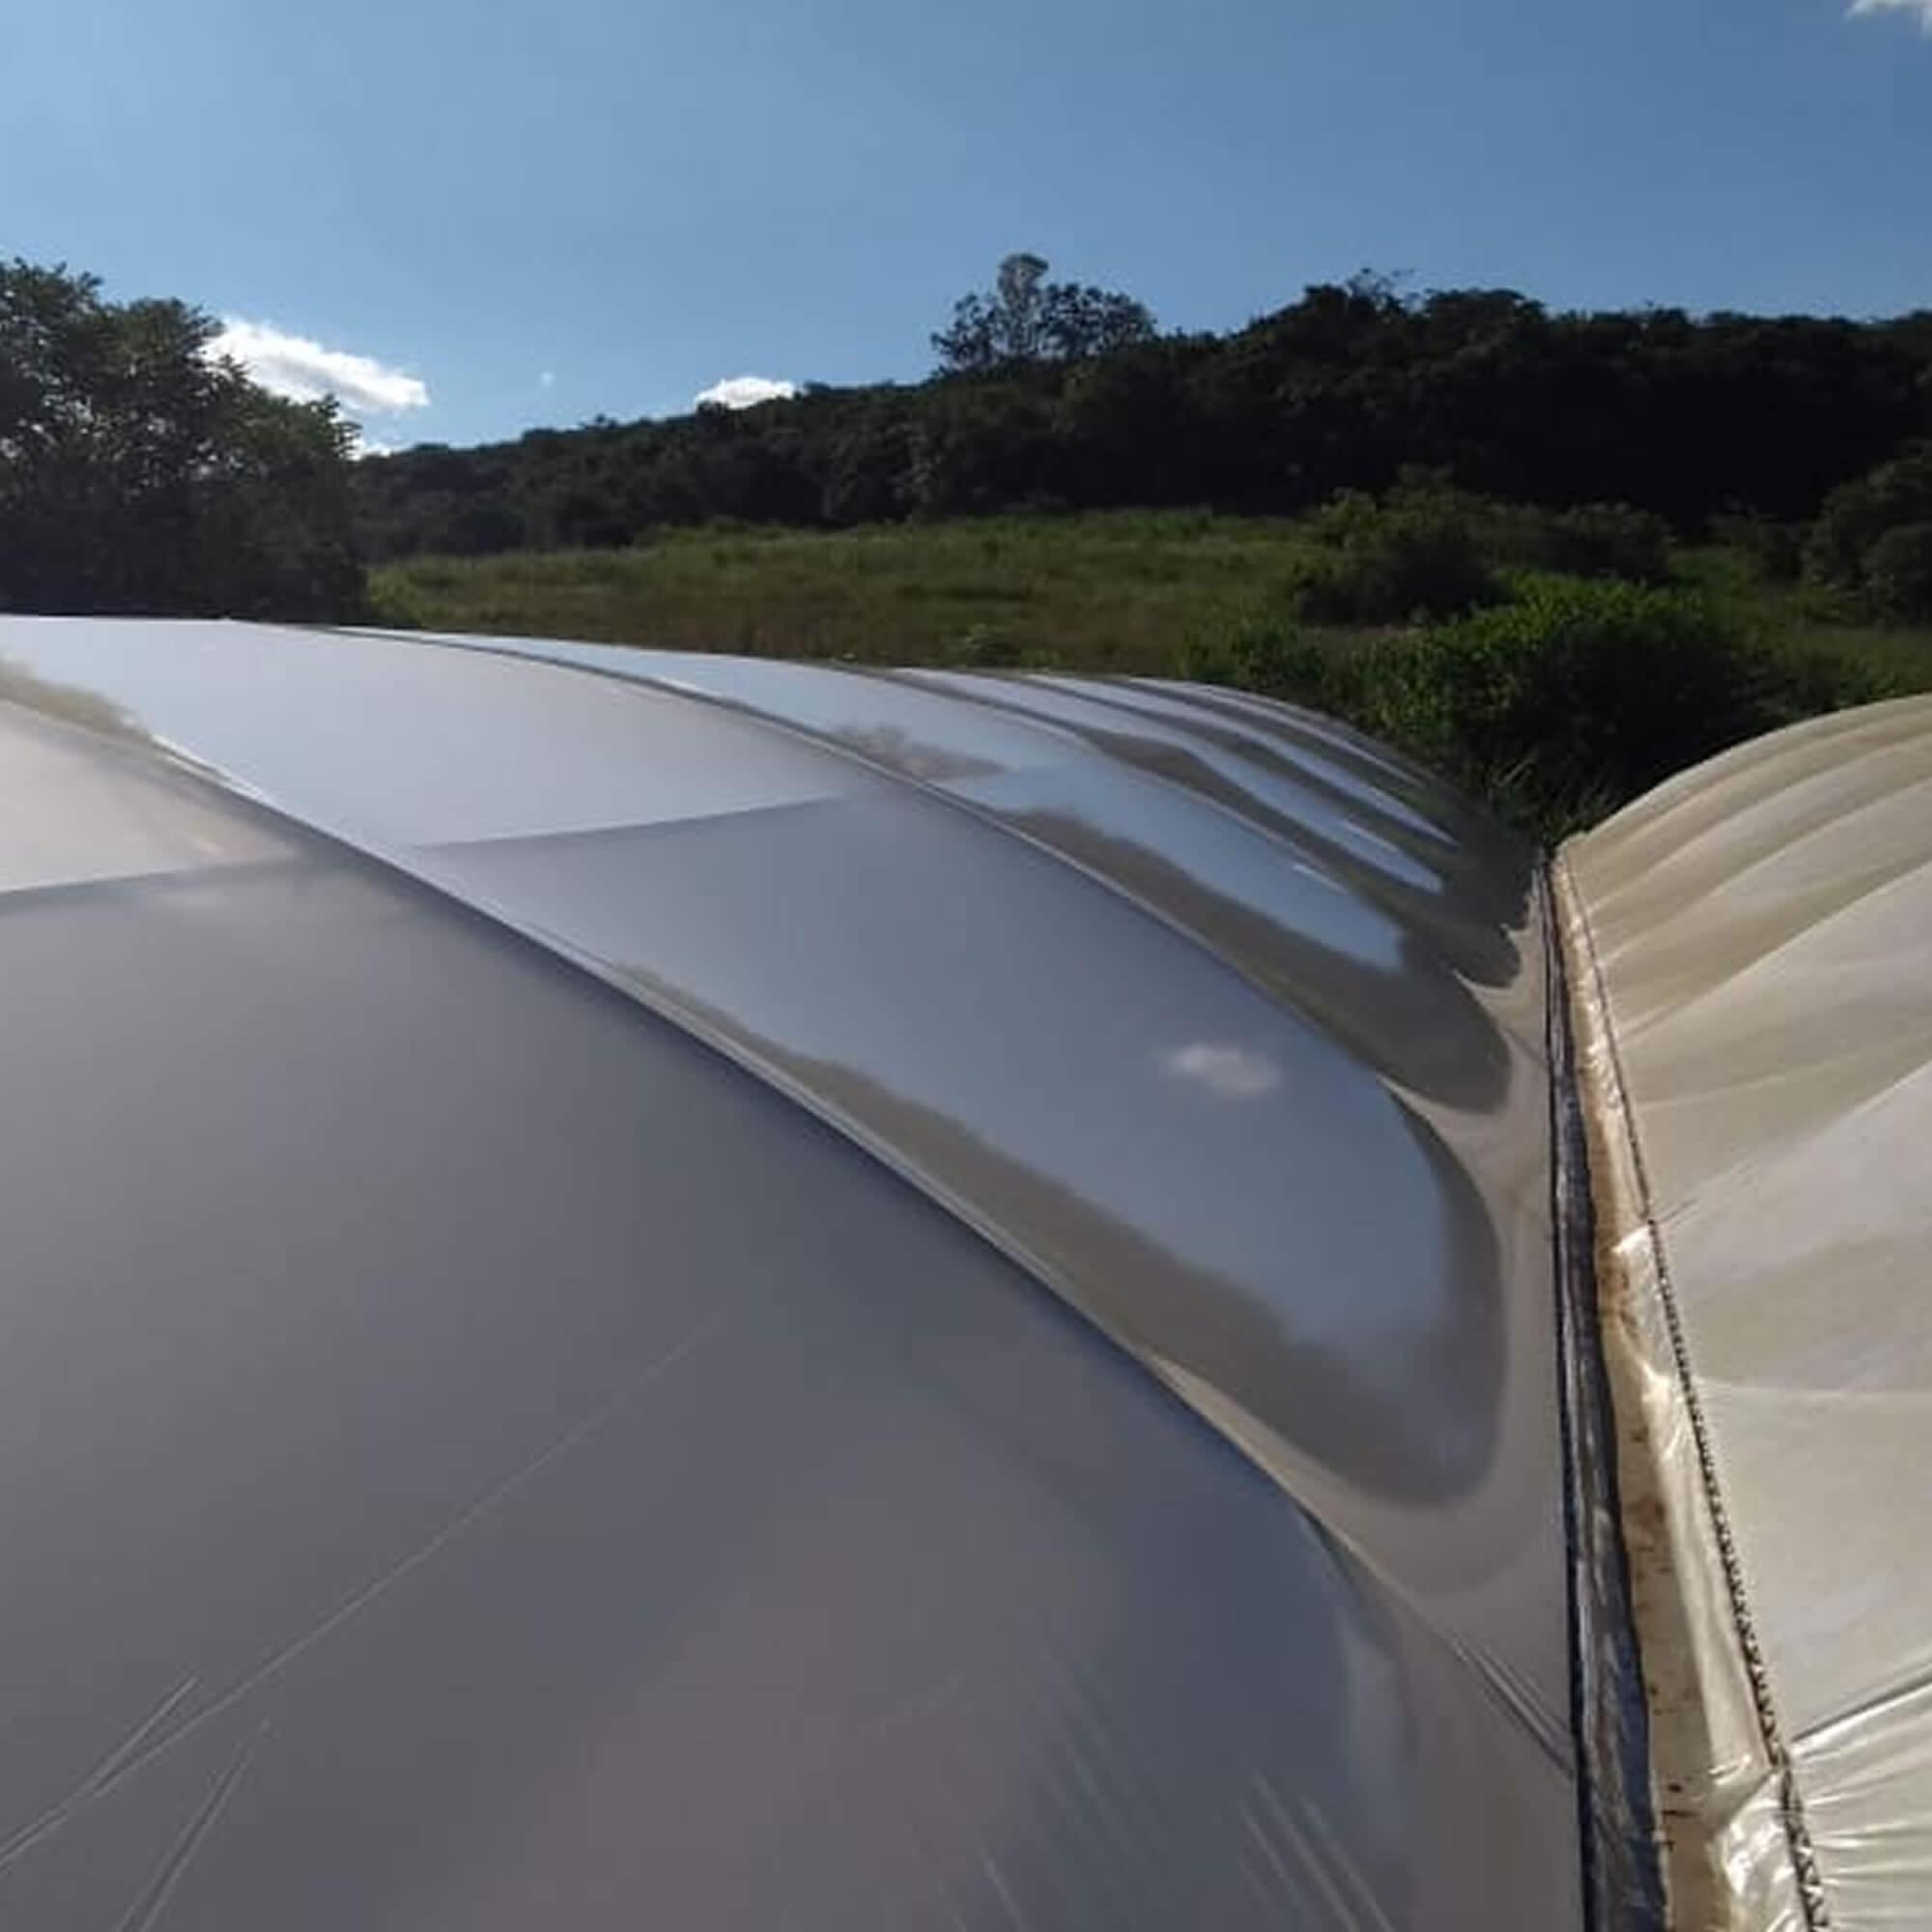 Filme Plástico Difusor para Estufa - 9 x 10 metros - 120 micras - Politiv